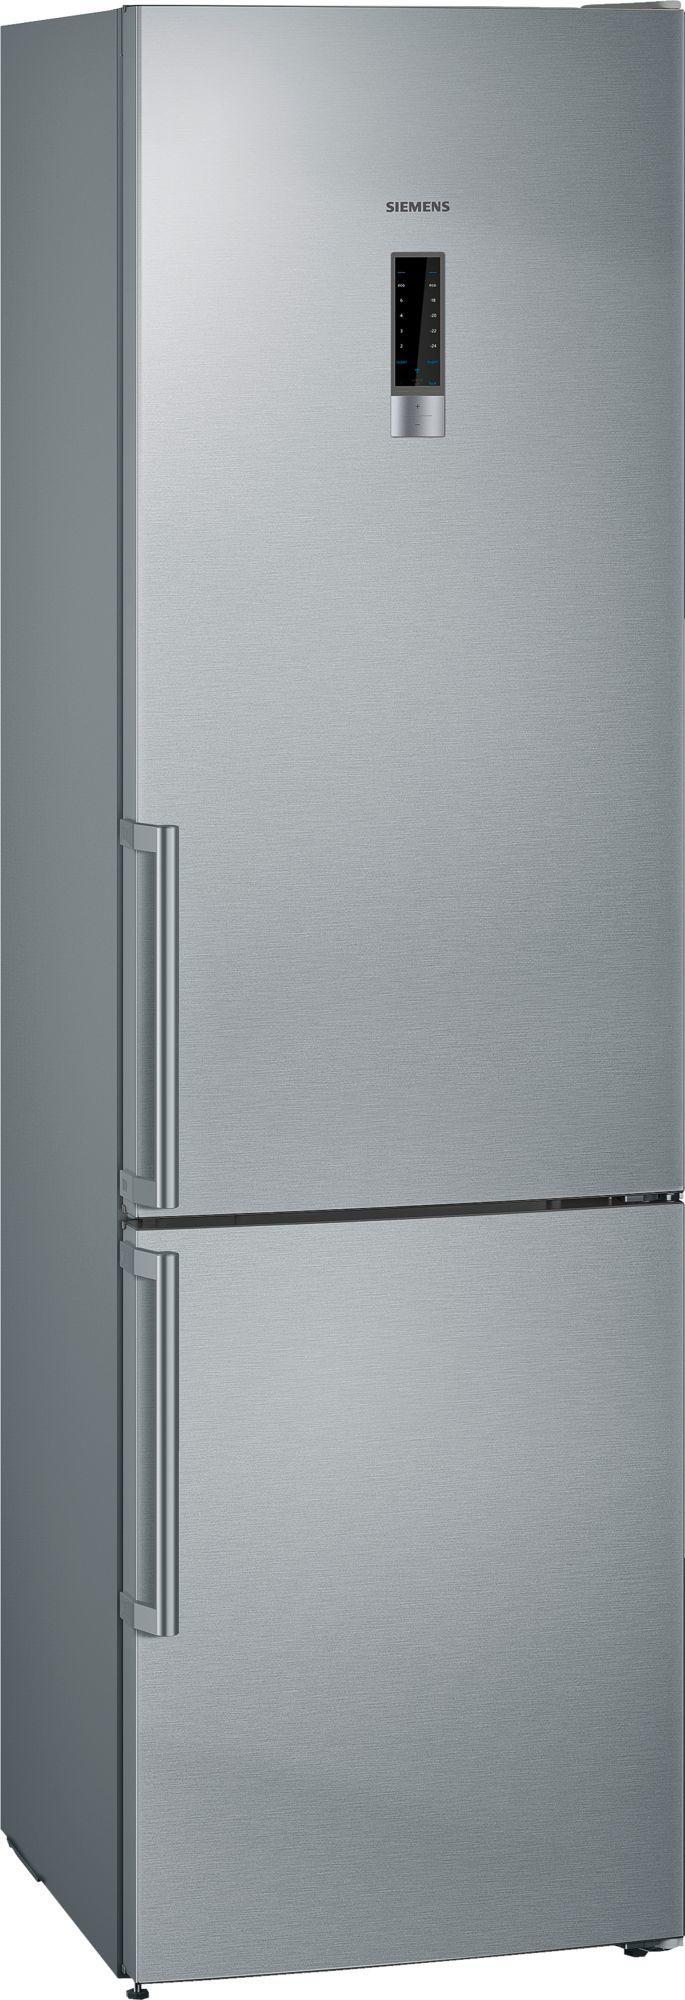 Image of iQ300 KG39NMIESG 60cm 366 Litre Frost Free Fridge Freezer | Silver Innox